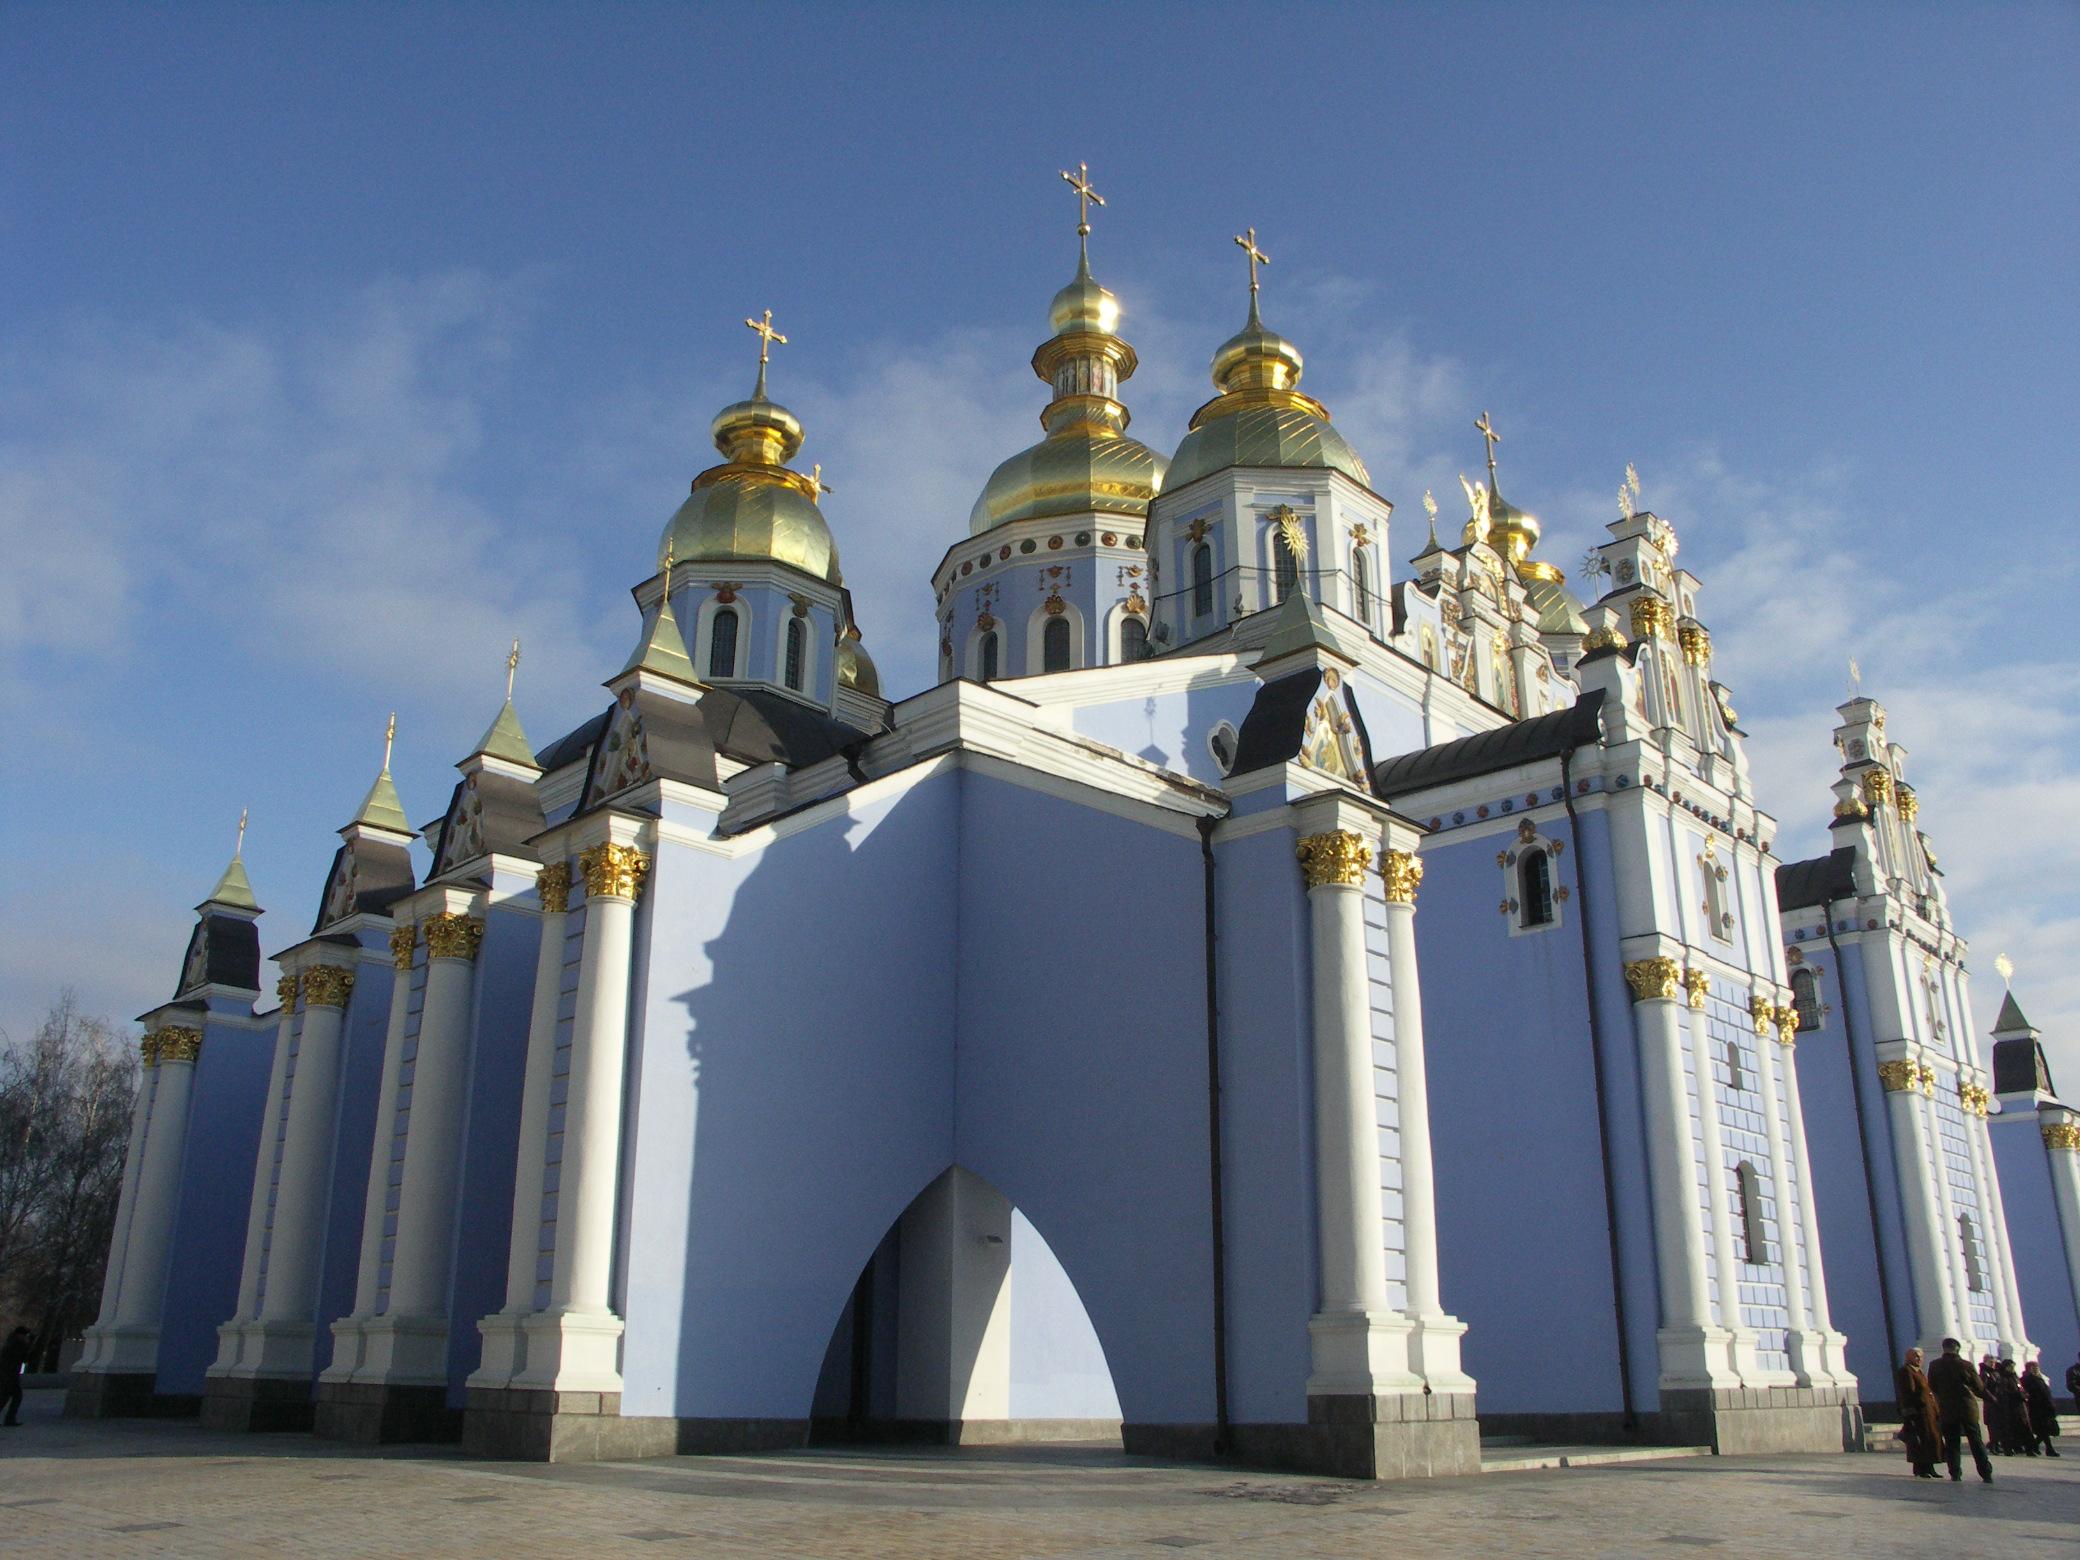 Kiev 2006 - 056: Monastero Mikhailovskiy Zlatoverkhiy del XII sec. (Cattedrale Ortodossa di San Michele Arcangelo)